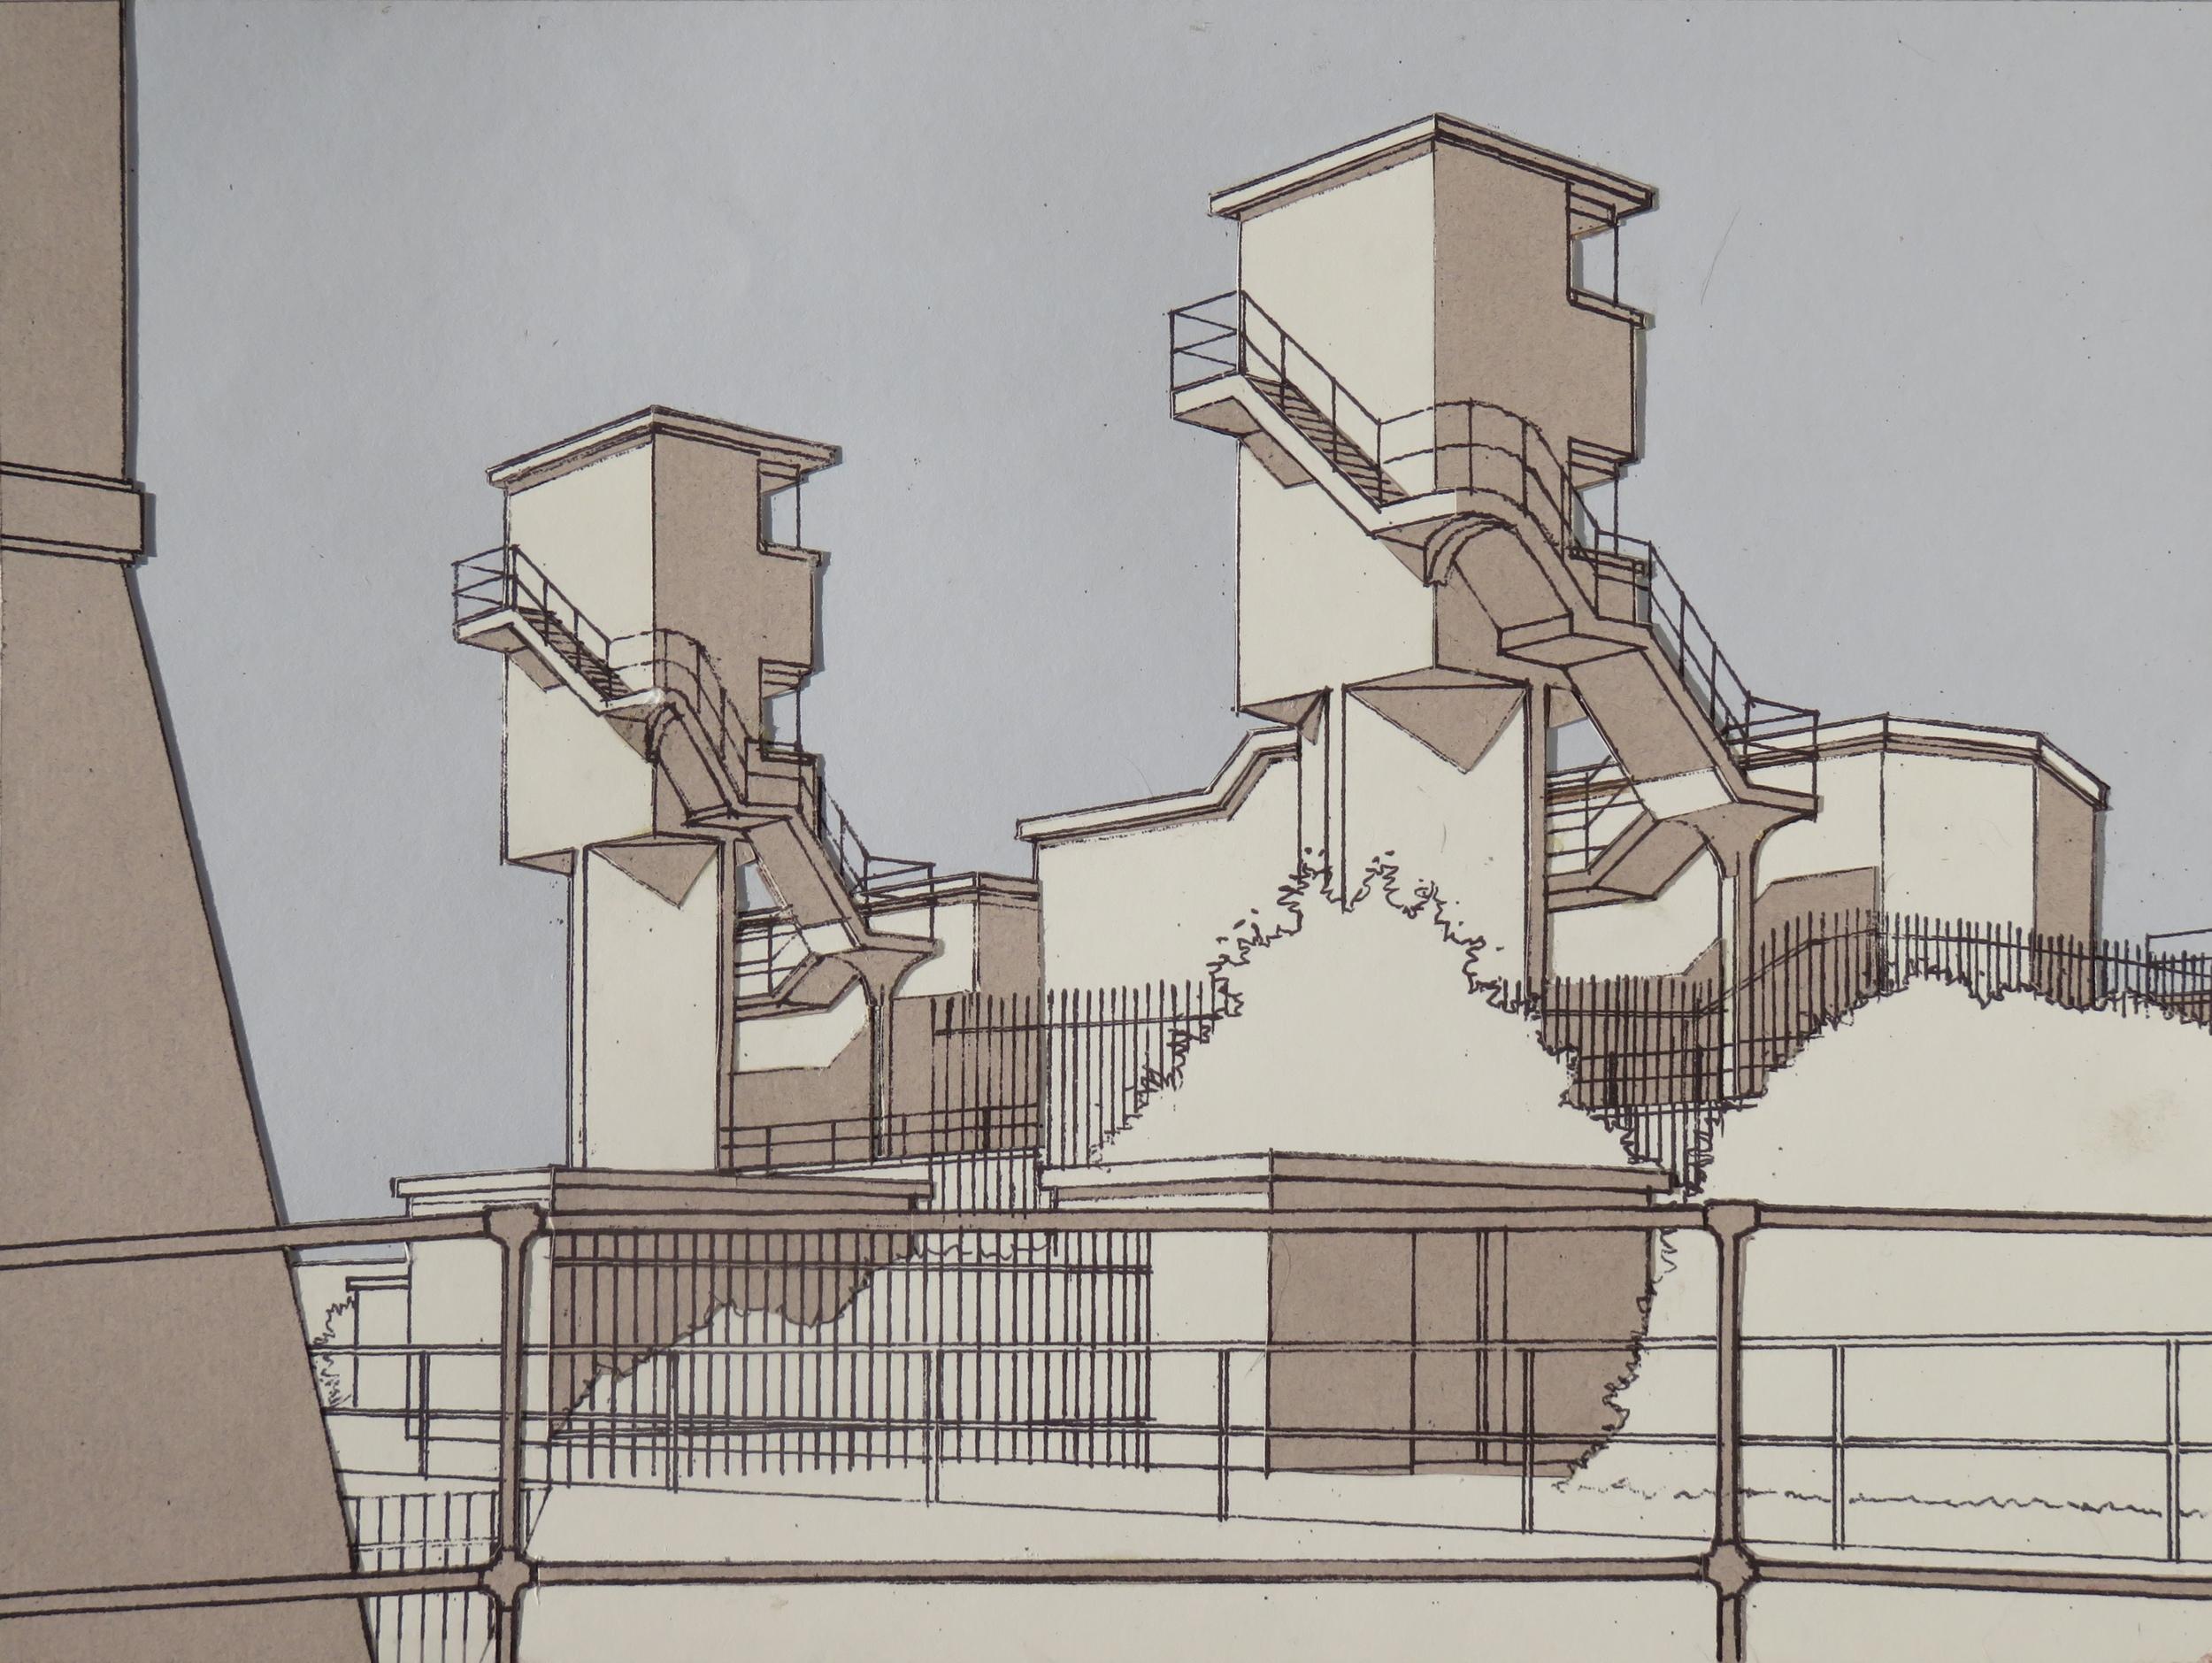 Landguard Towers